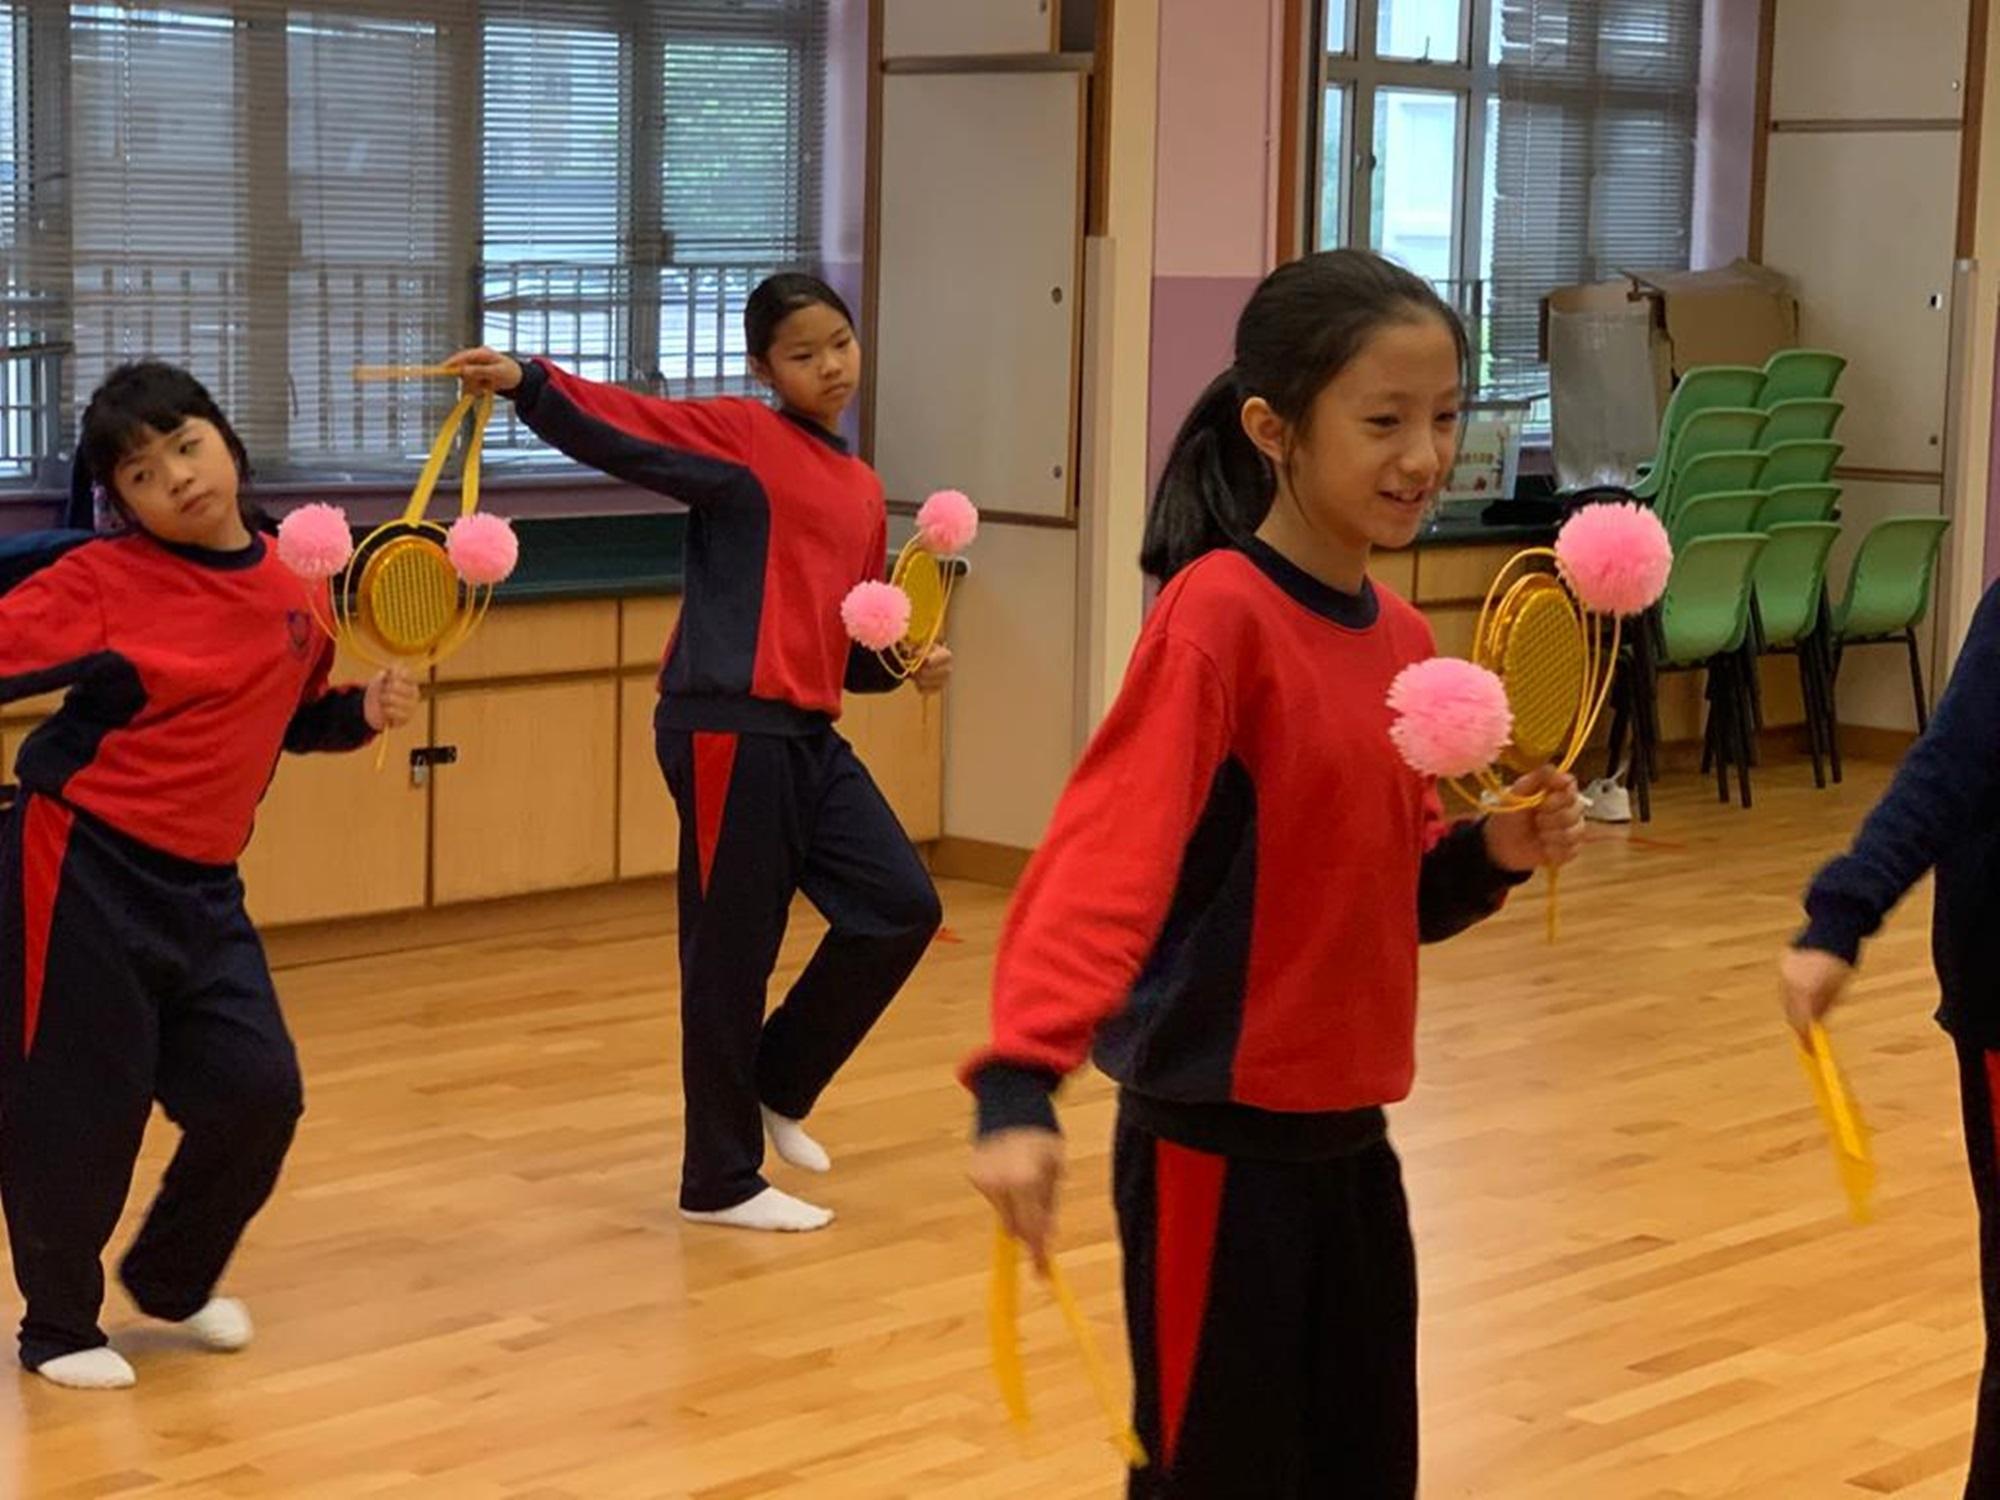 https://www.skhtswlo.edu.hk/sites/default/files/whatsapp_image_2020-01-16_at_7.24.03_pm.jpeg